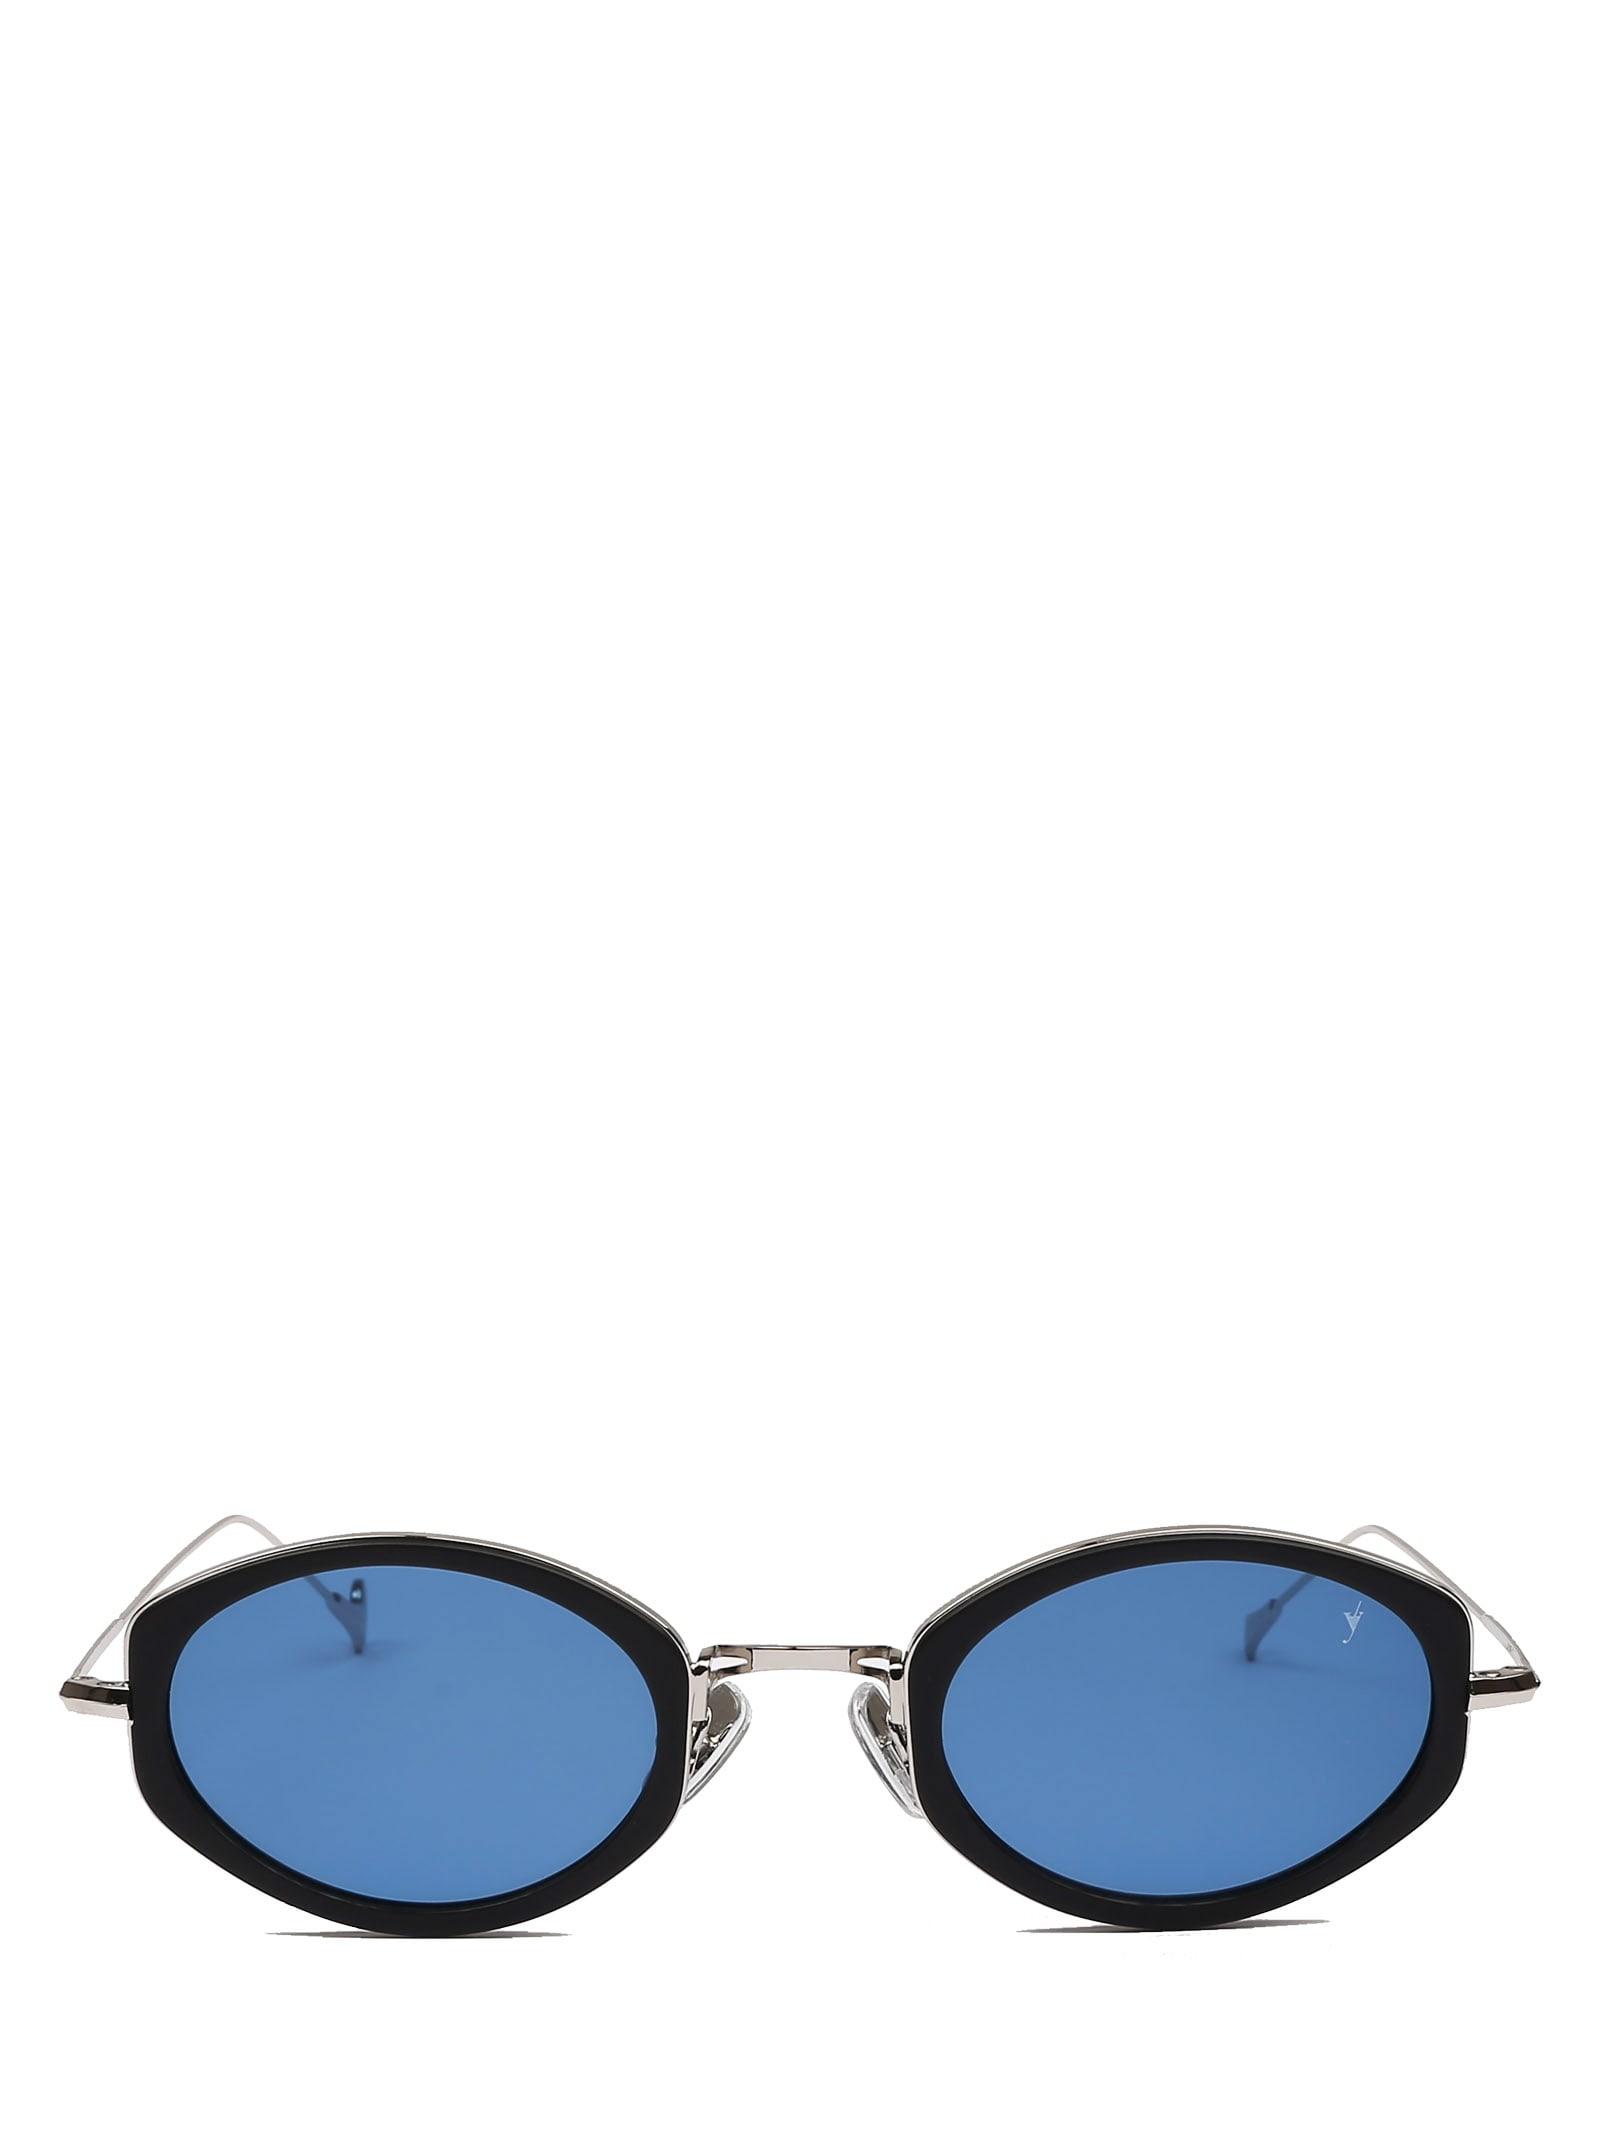 Eyepetizer Eyepetizer Grace C.b-1-2 Sunglasses